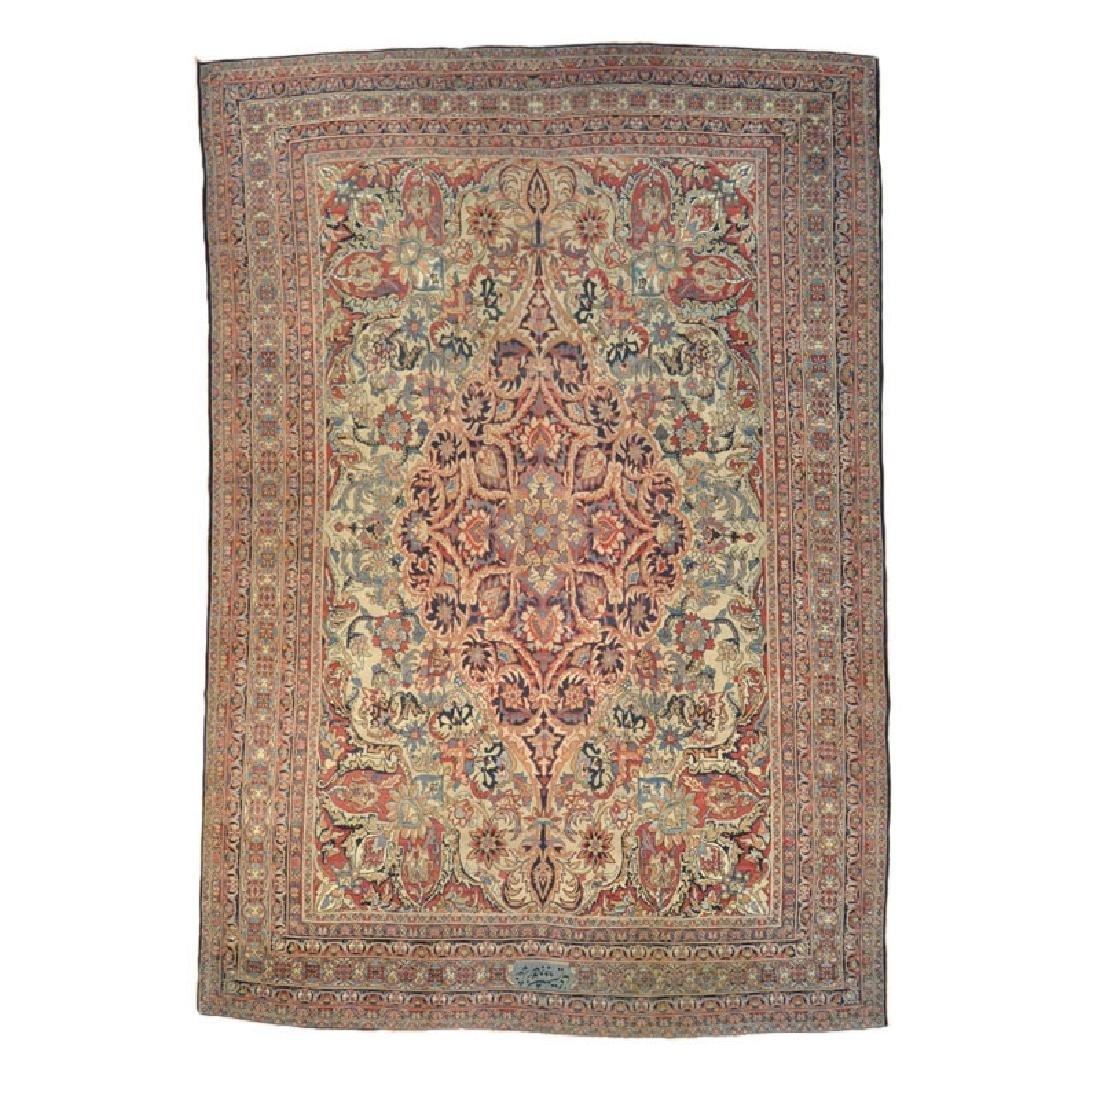 Persian Handmade Oversize Signed Antique Lavar Kerman